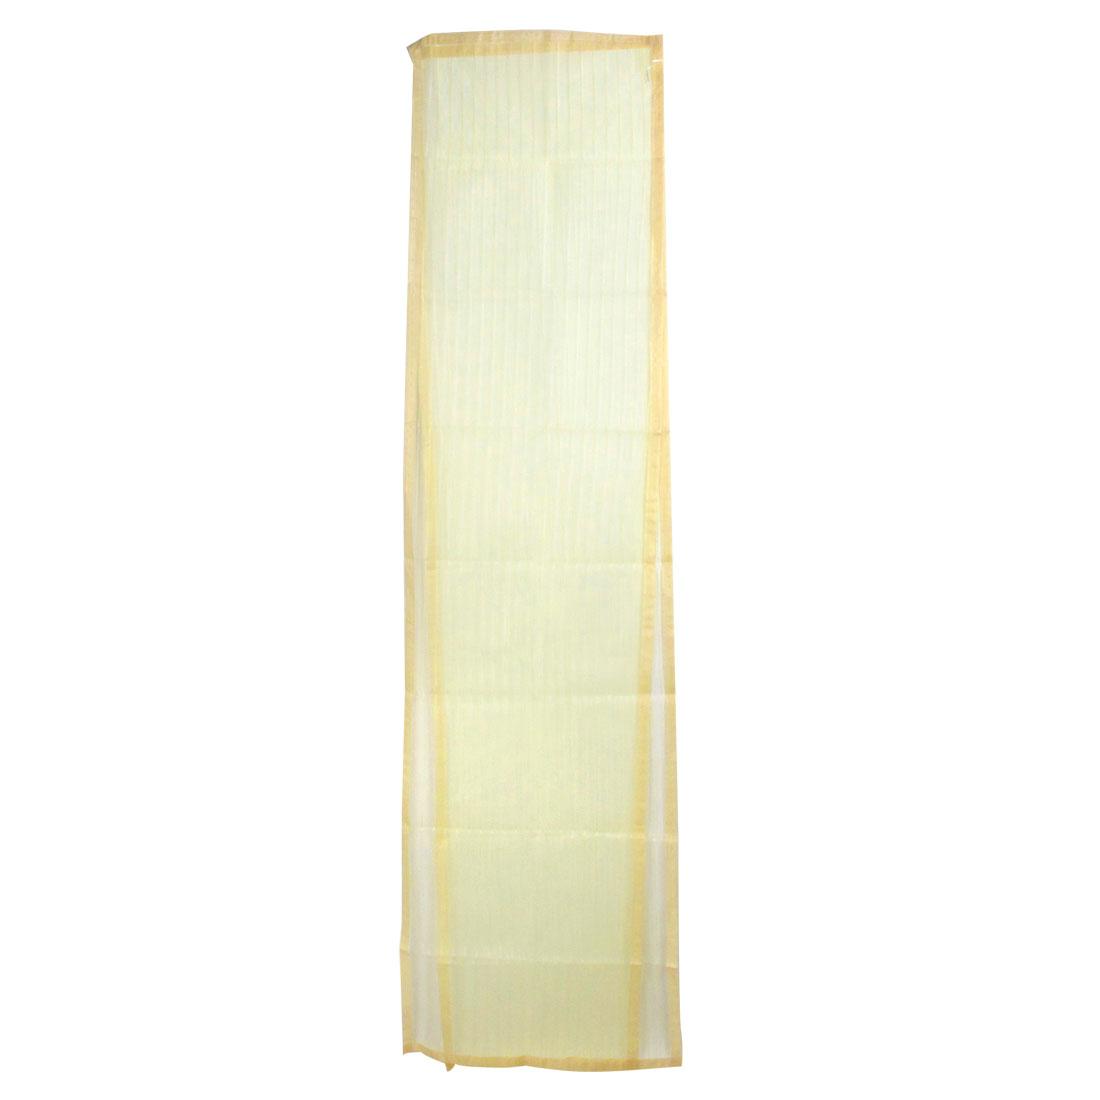 "Beige Magnetic Fly Screen Anti Mosquitoes Door Curtain 39.4"" x 78.7"""